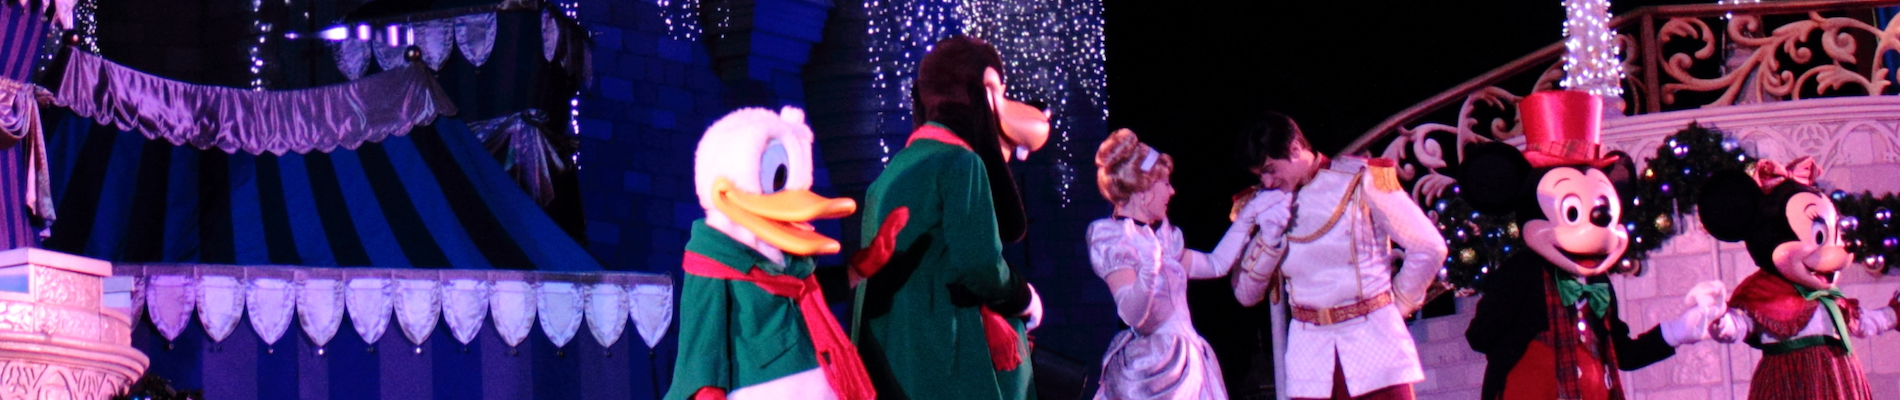 mickeys very merry christmas party at disney world - Very Merry Christmas Party